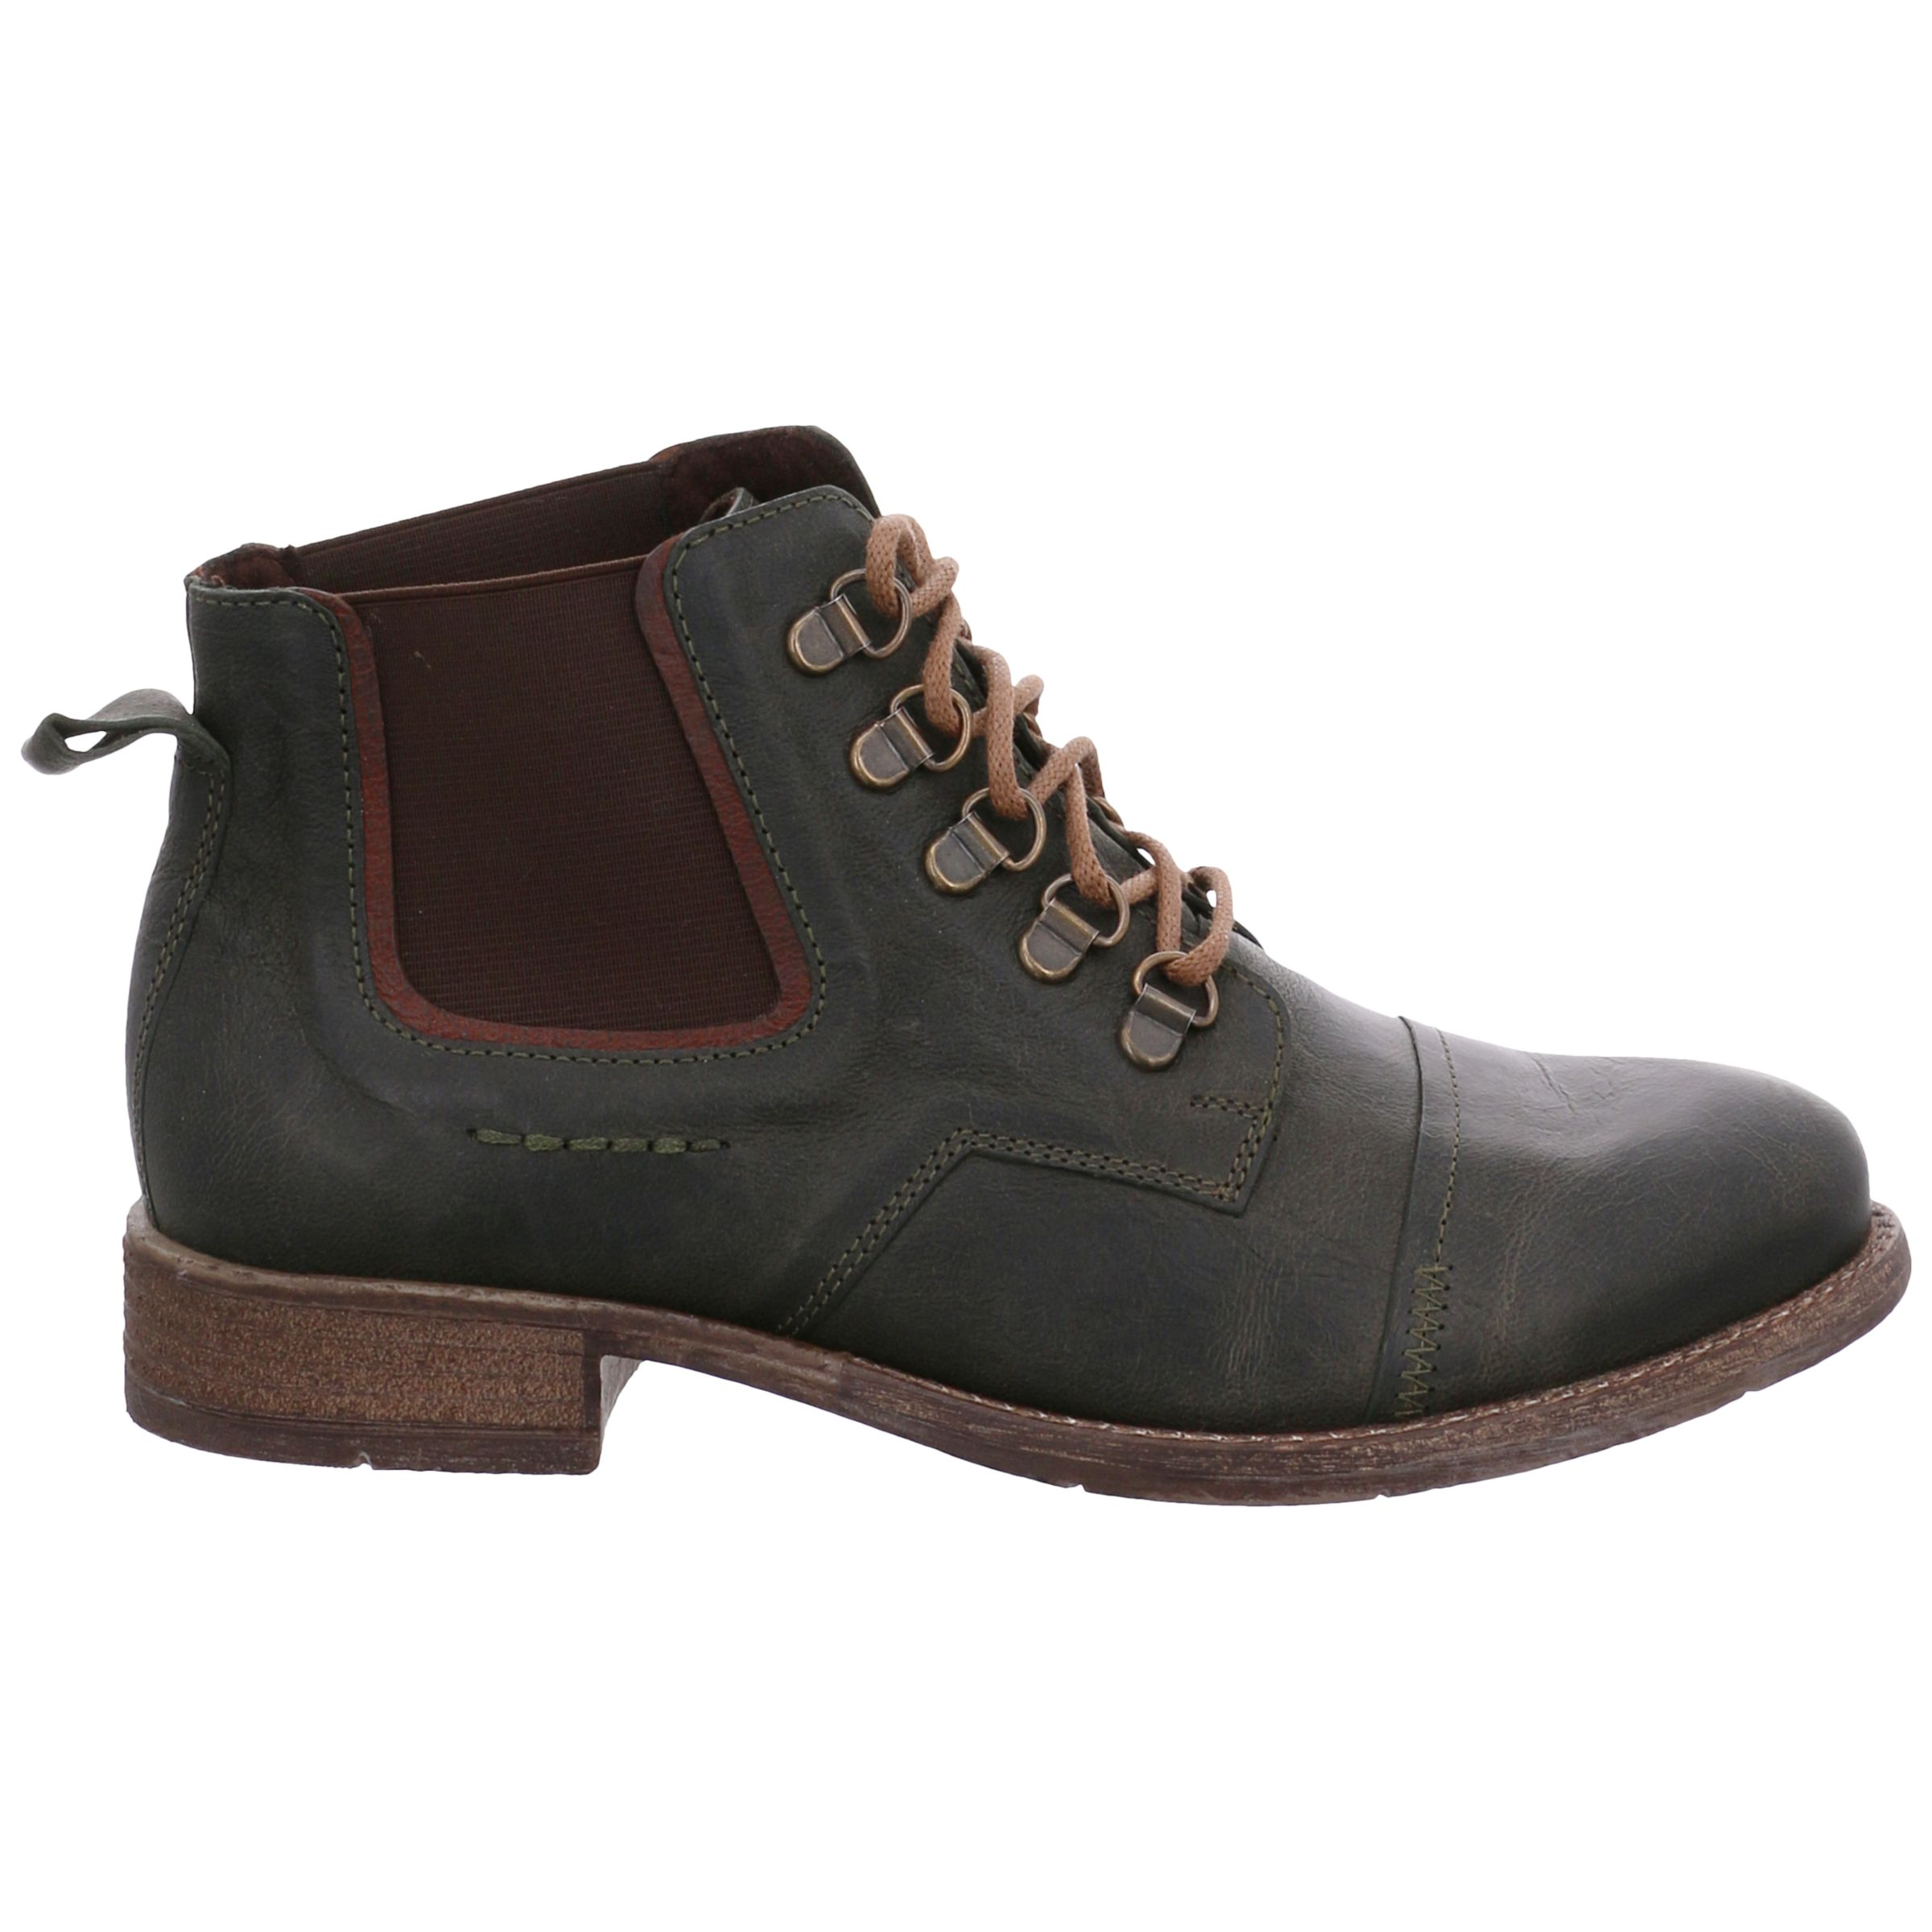 Josef Seibel Josef Seibel Sienna 09 Lace Up Ankle Boots